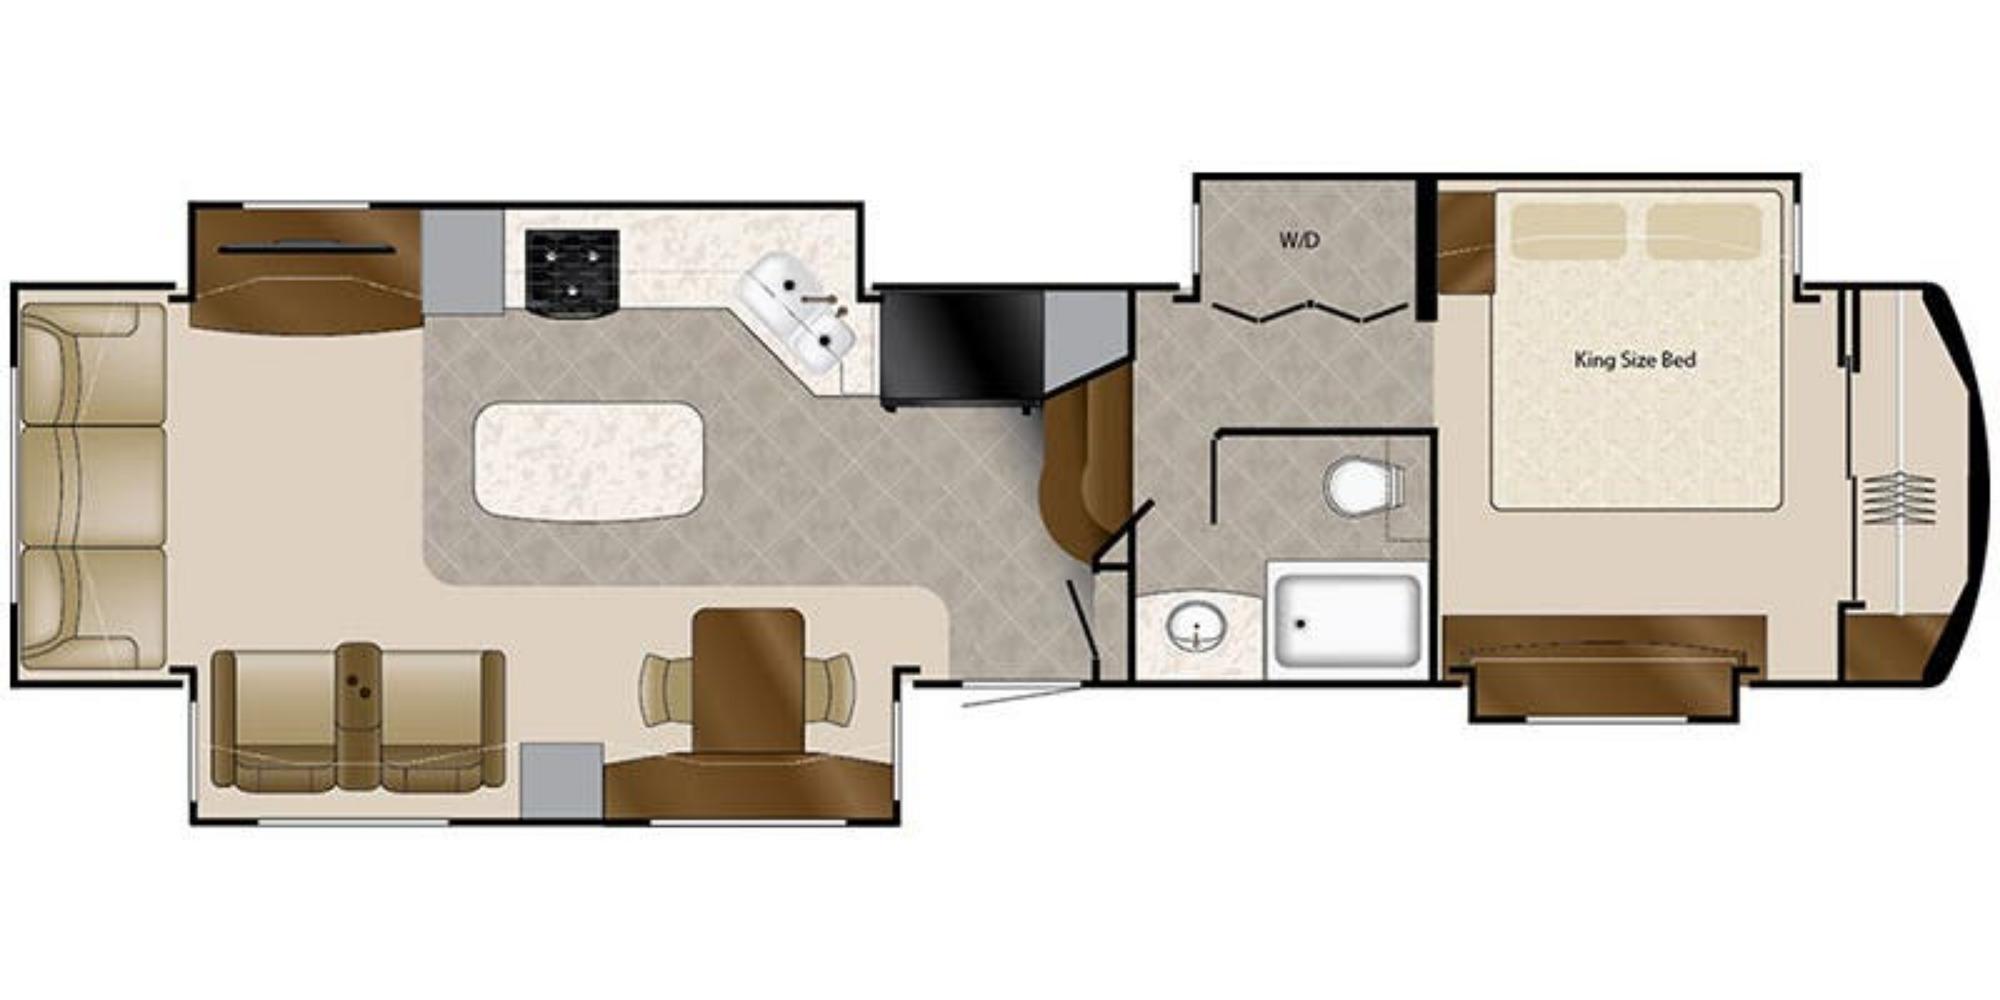 View Floor Plan for 2020 DRV LUXURY SUITES MOBILE SUITES 40KSSB4